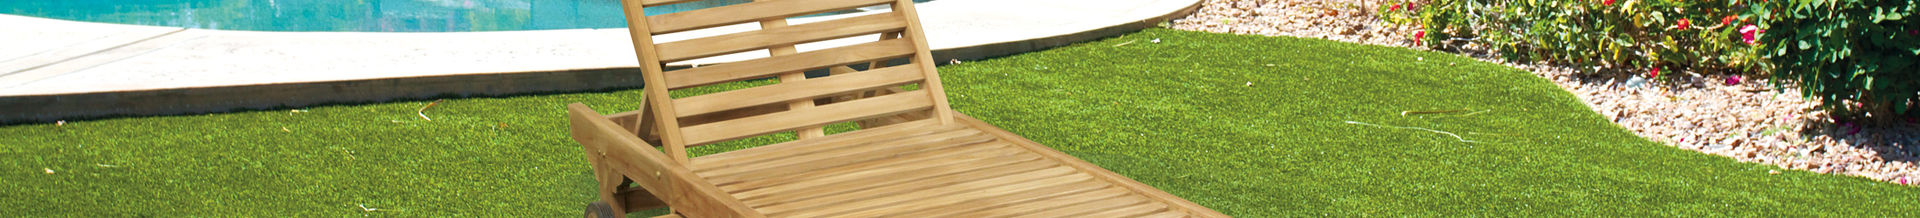 offerta mobili arredamento giardino offerta tavoli arredamento giardino